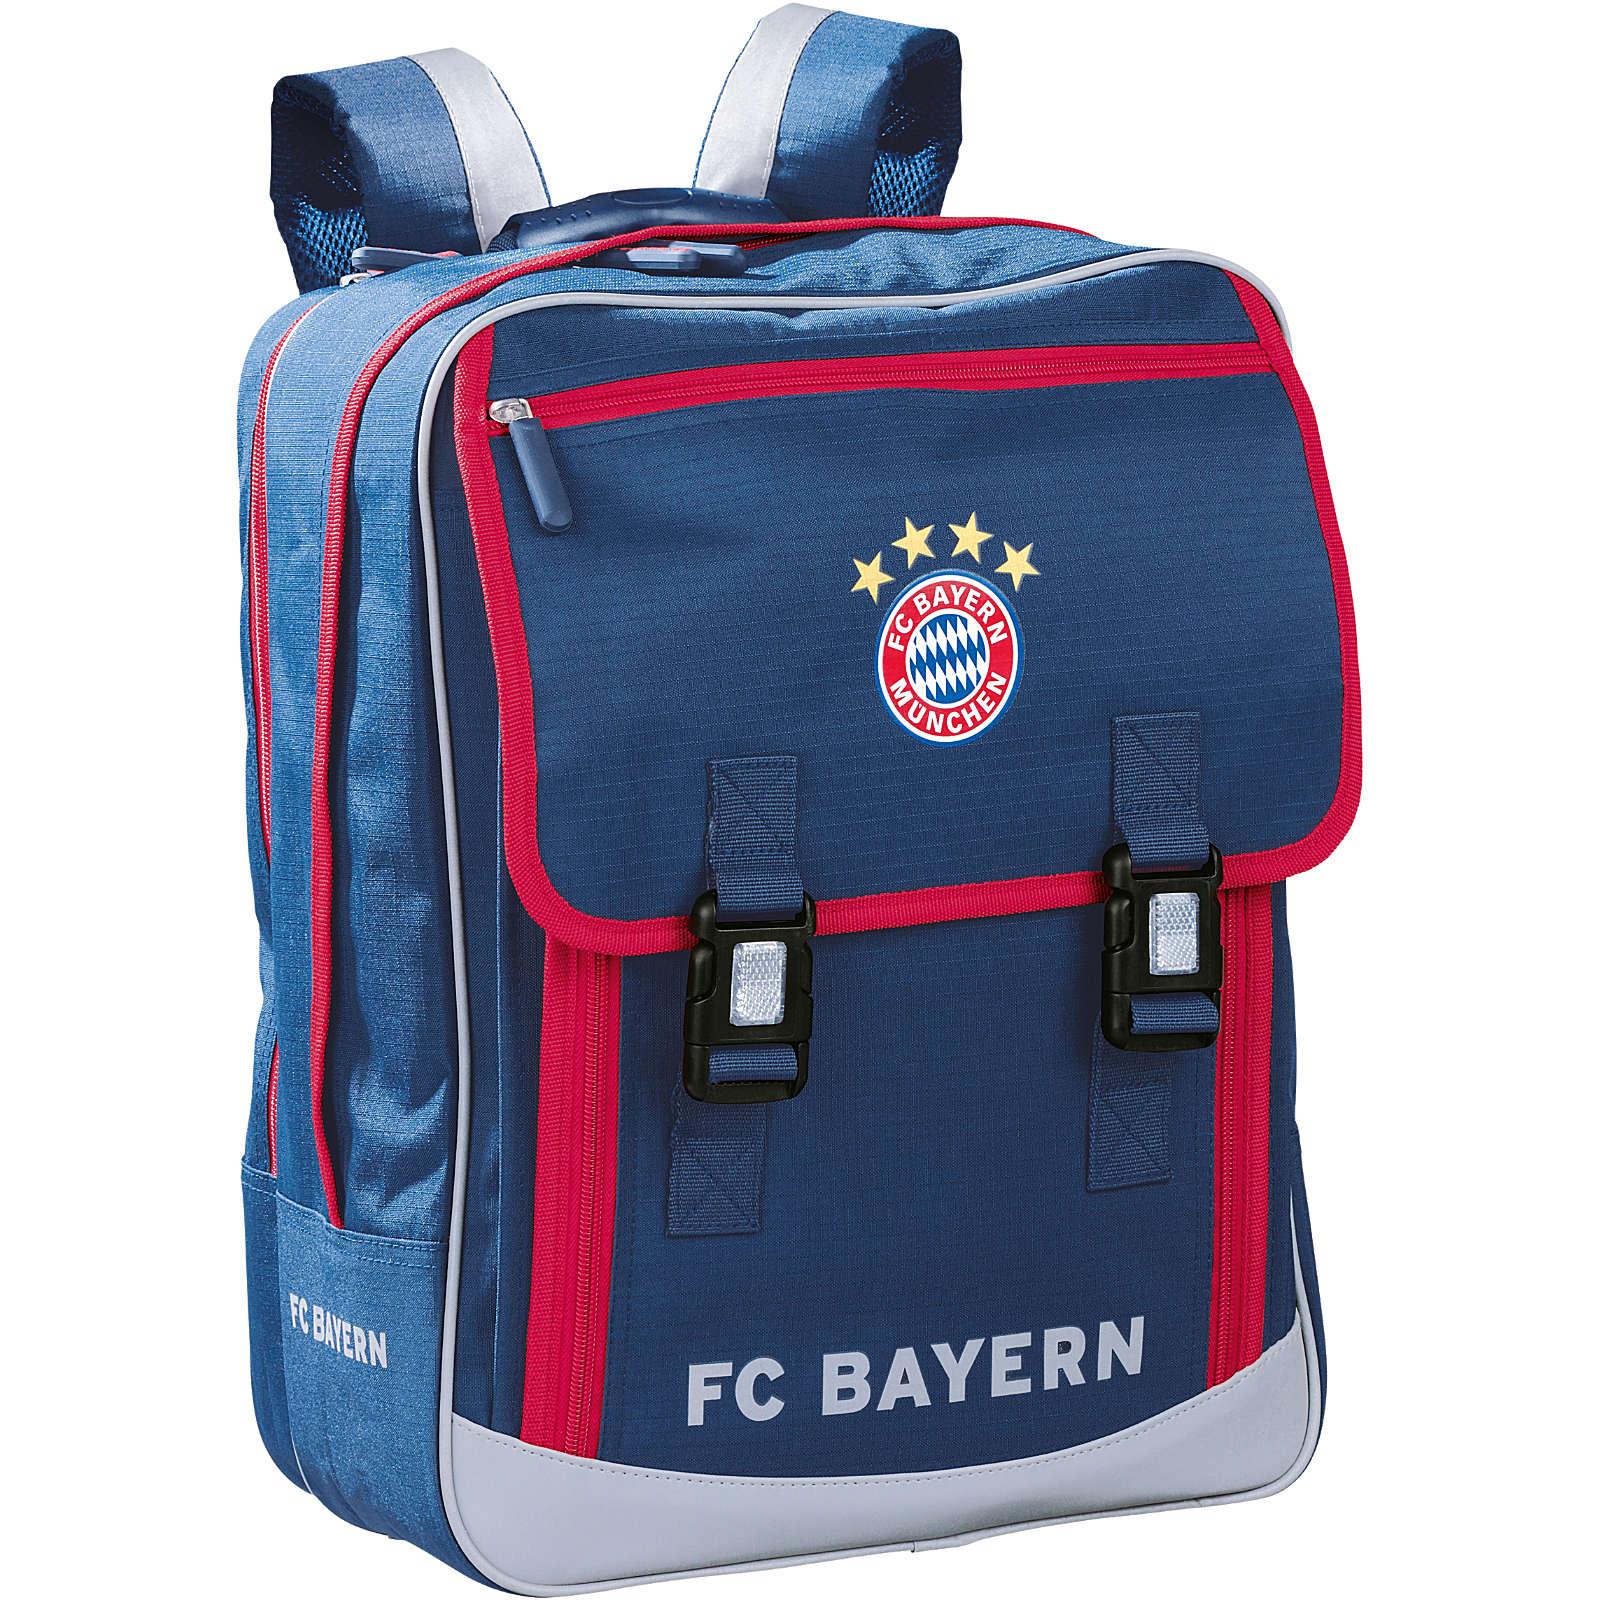 Schulrucksack Classic FC Bayern München blau